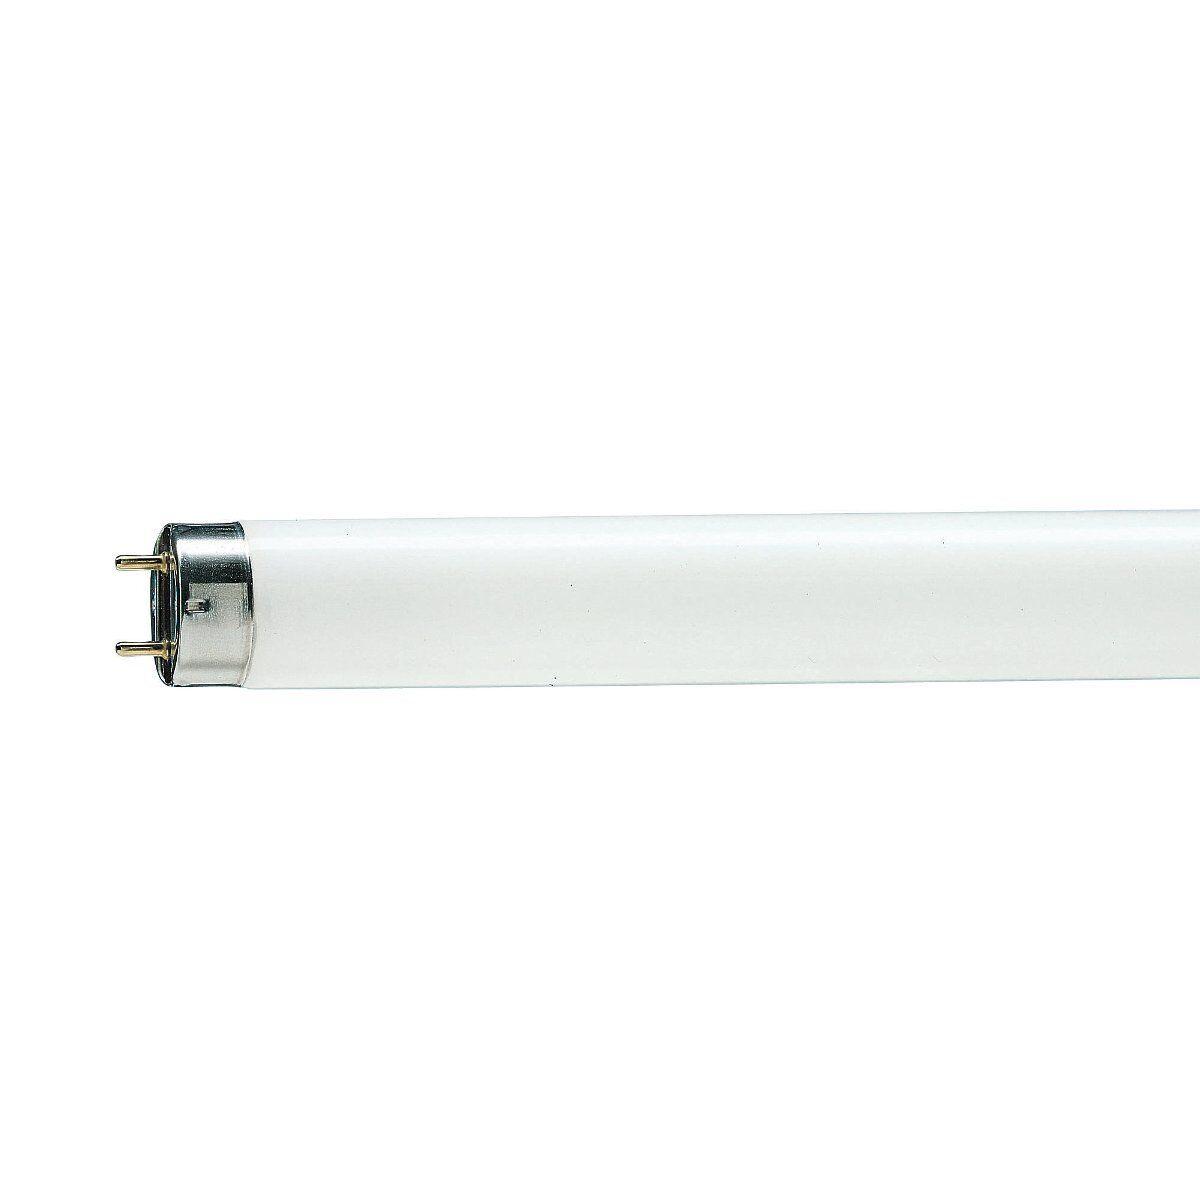 10x Philips Leuchtstoffröhre MASTER TL-D De Luxe - T8, 965 Tageslicht - 58W